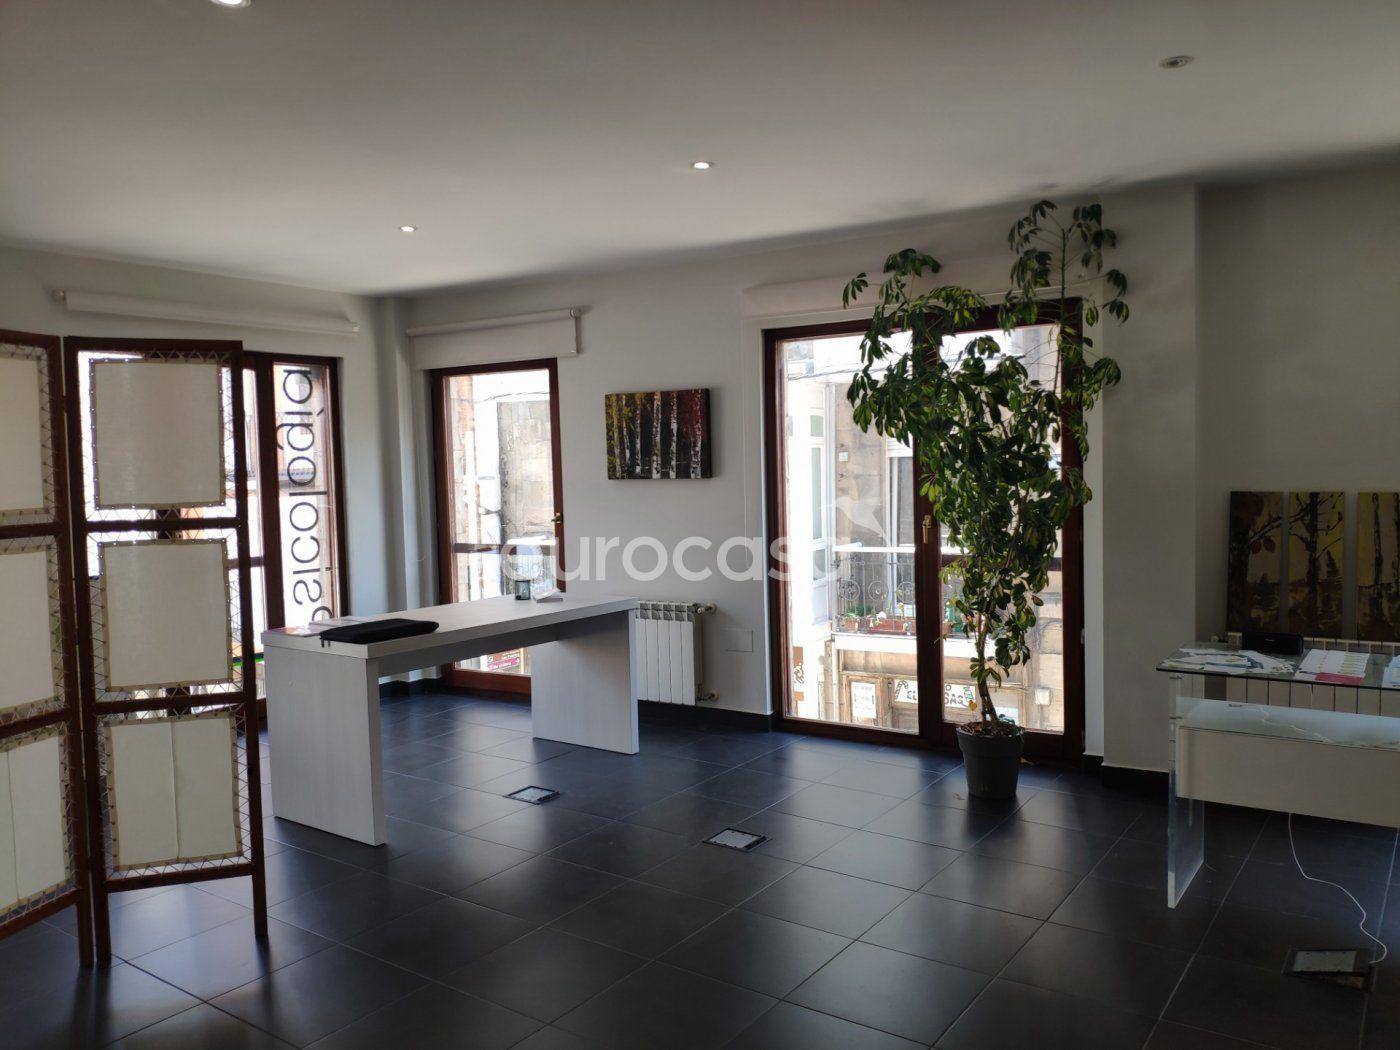 Oficina · Reinosa · Centro 600€ MES€